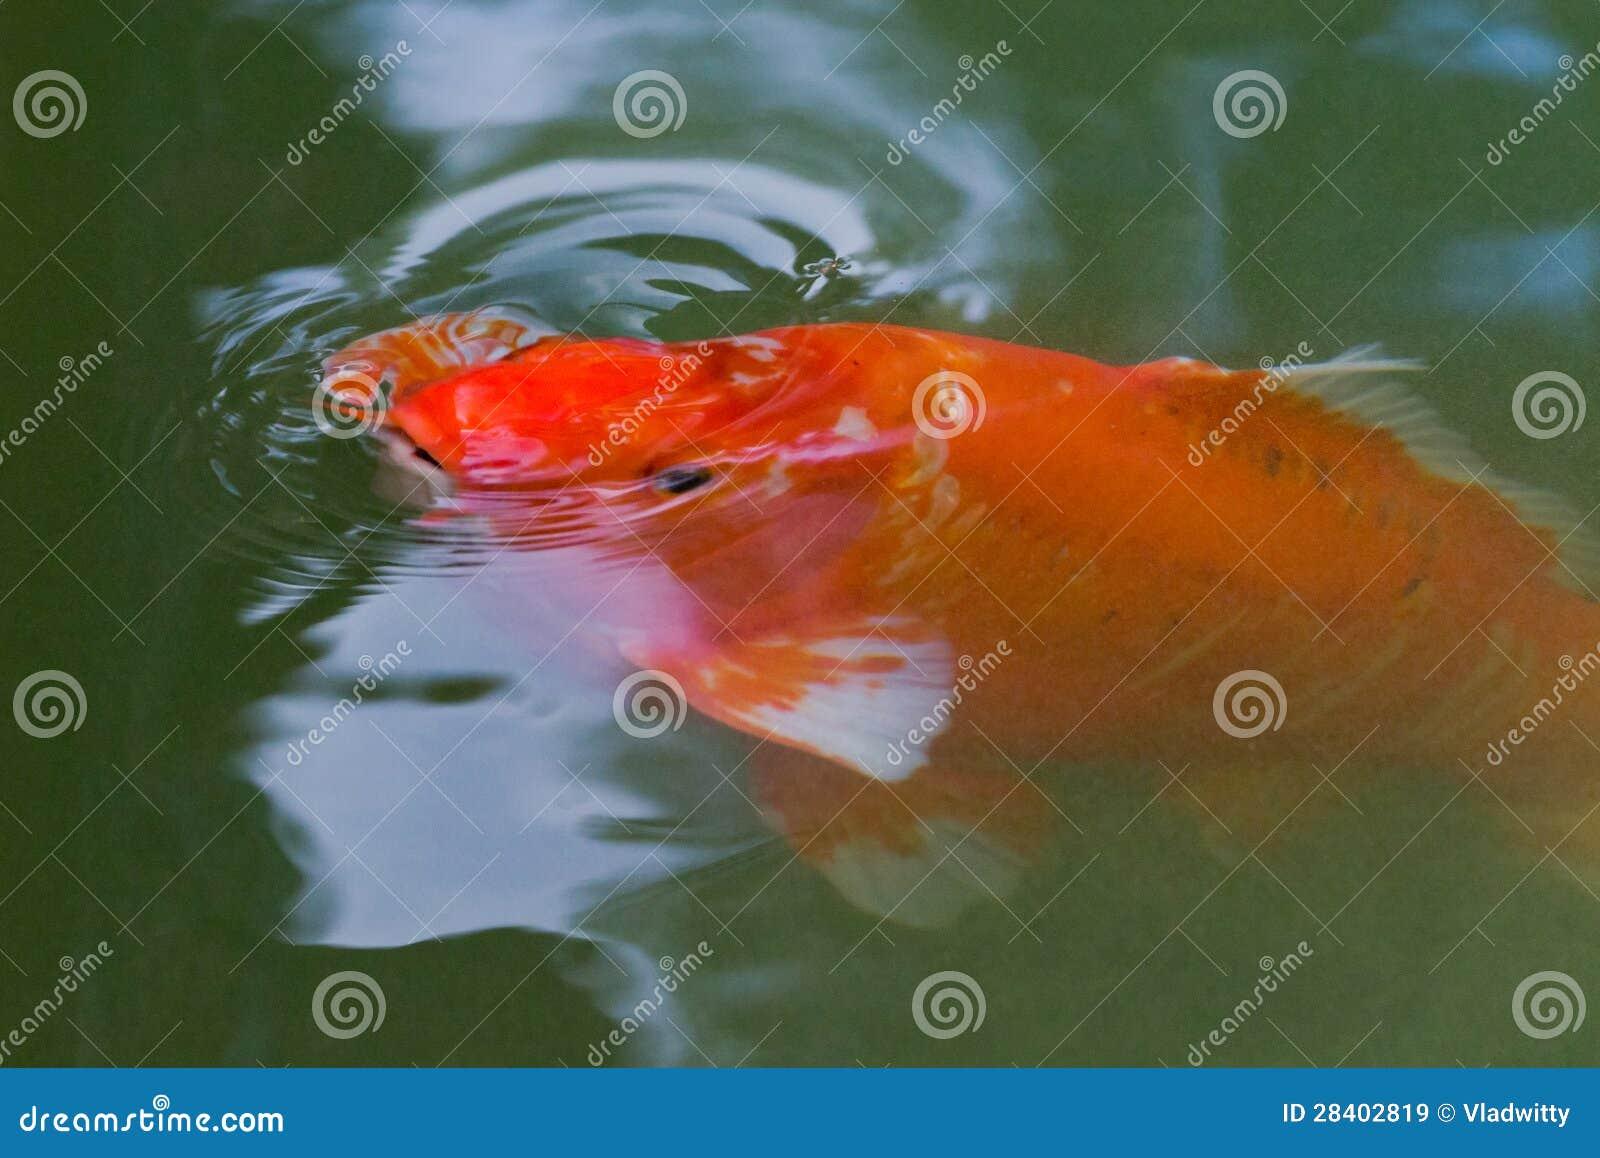 Red carp koi fish royalty free stock images image 28402819 for Red koi fish